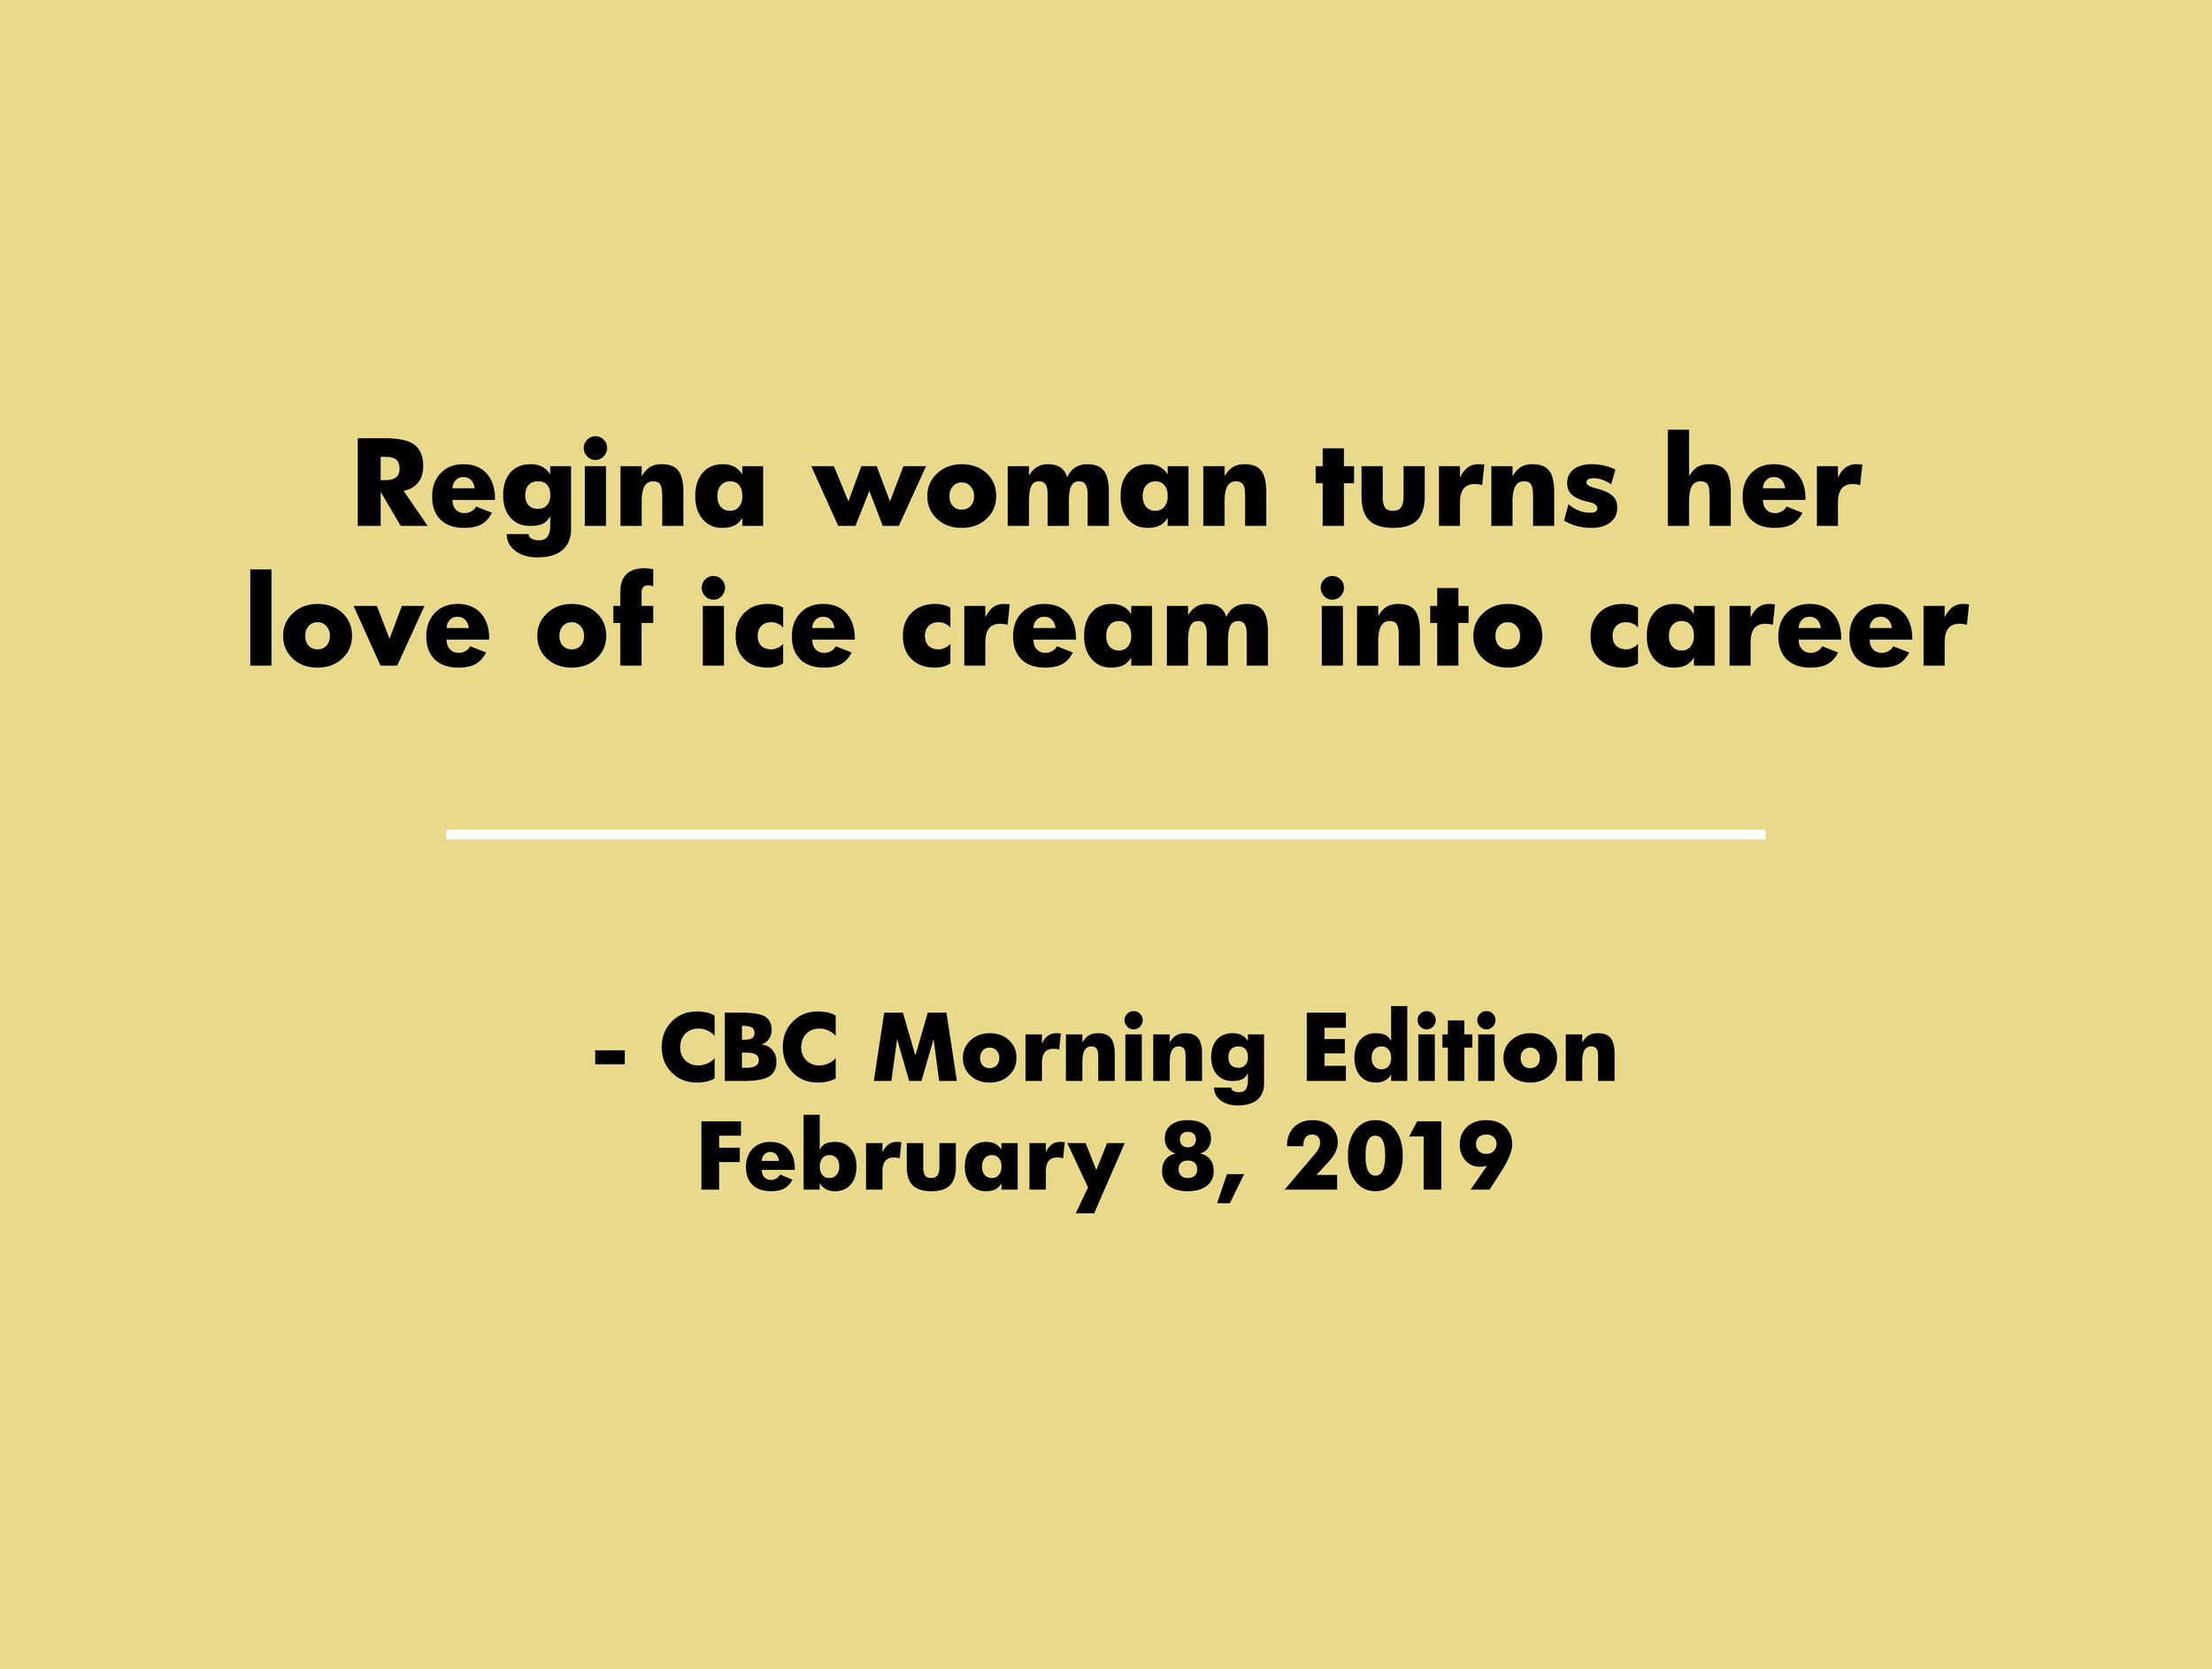 CBC Morning Edition Feb. 8, 2019